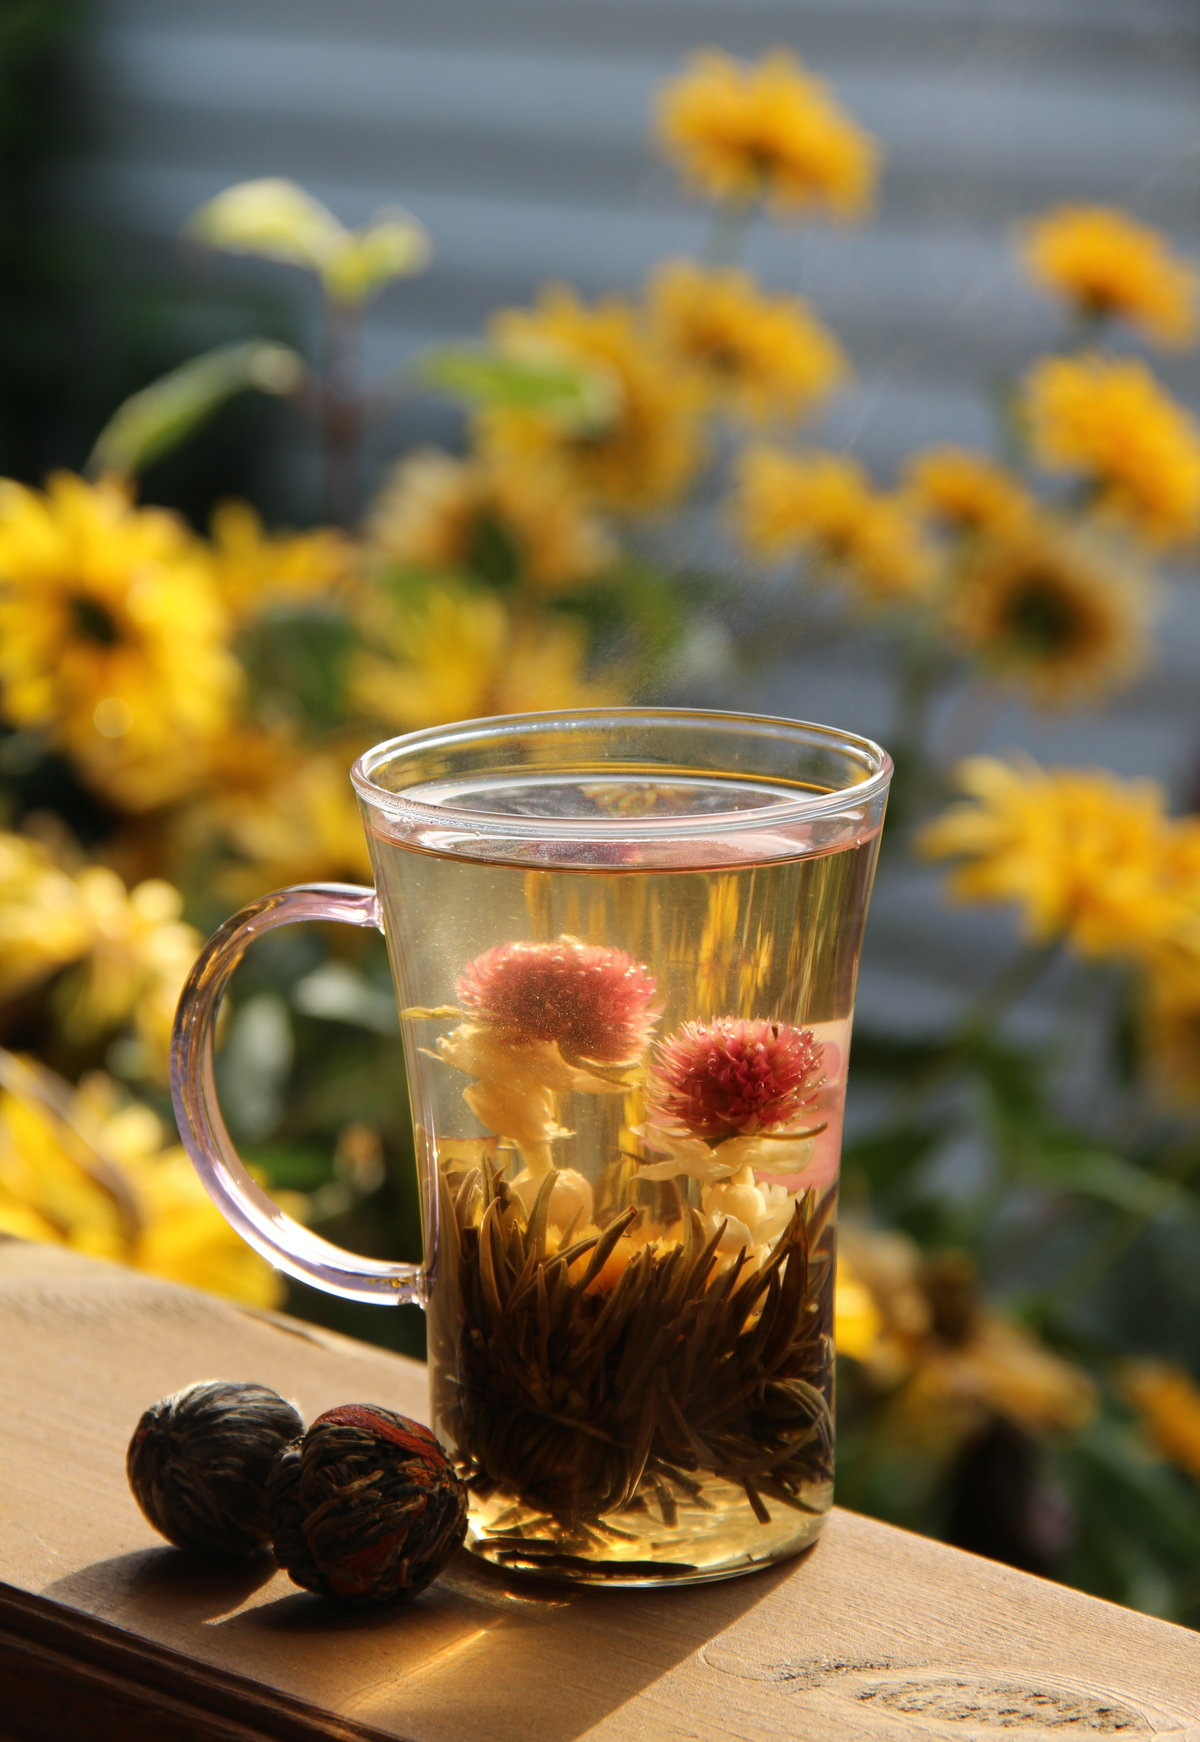 цветы чая картинки цены